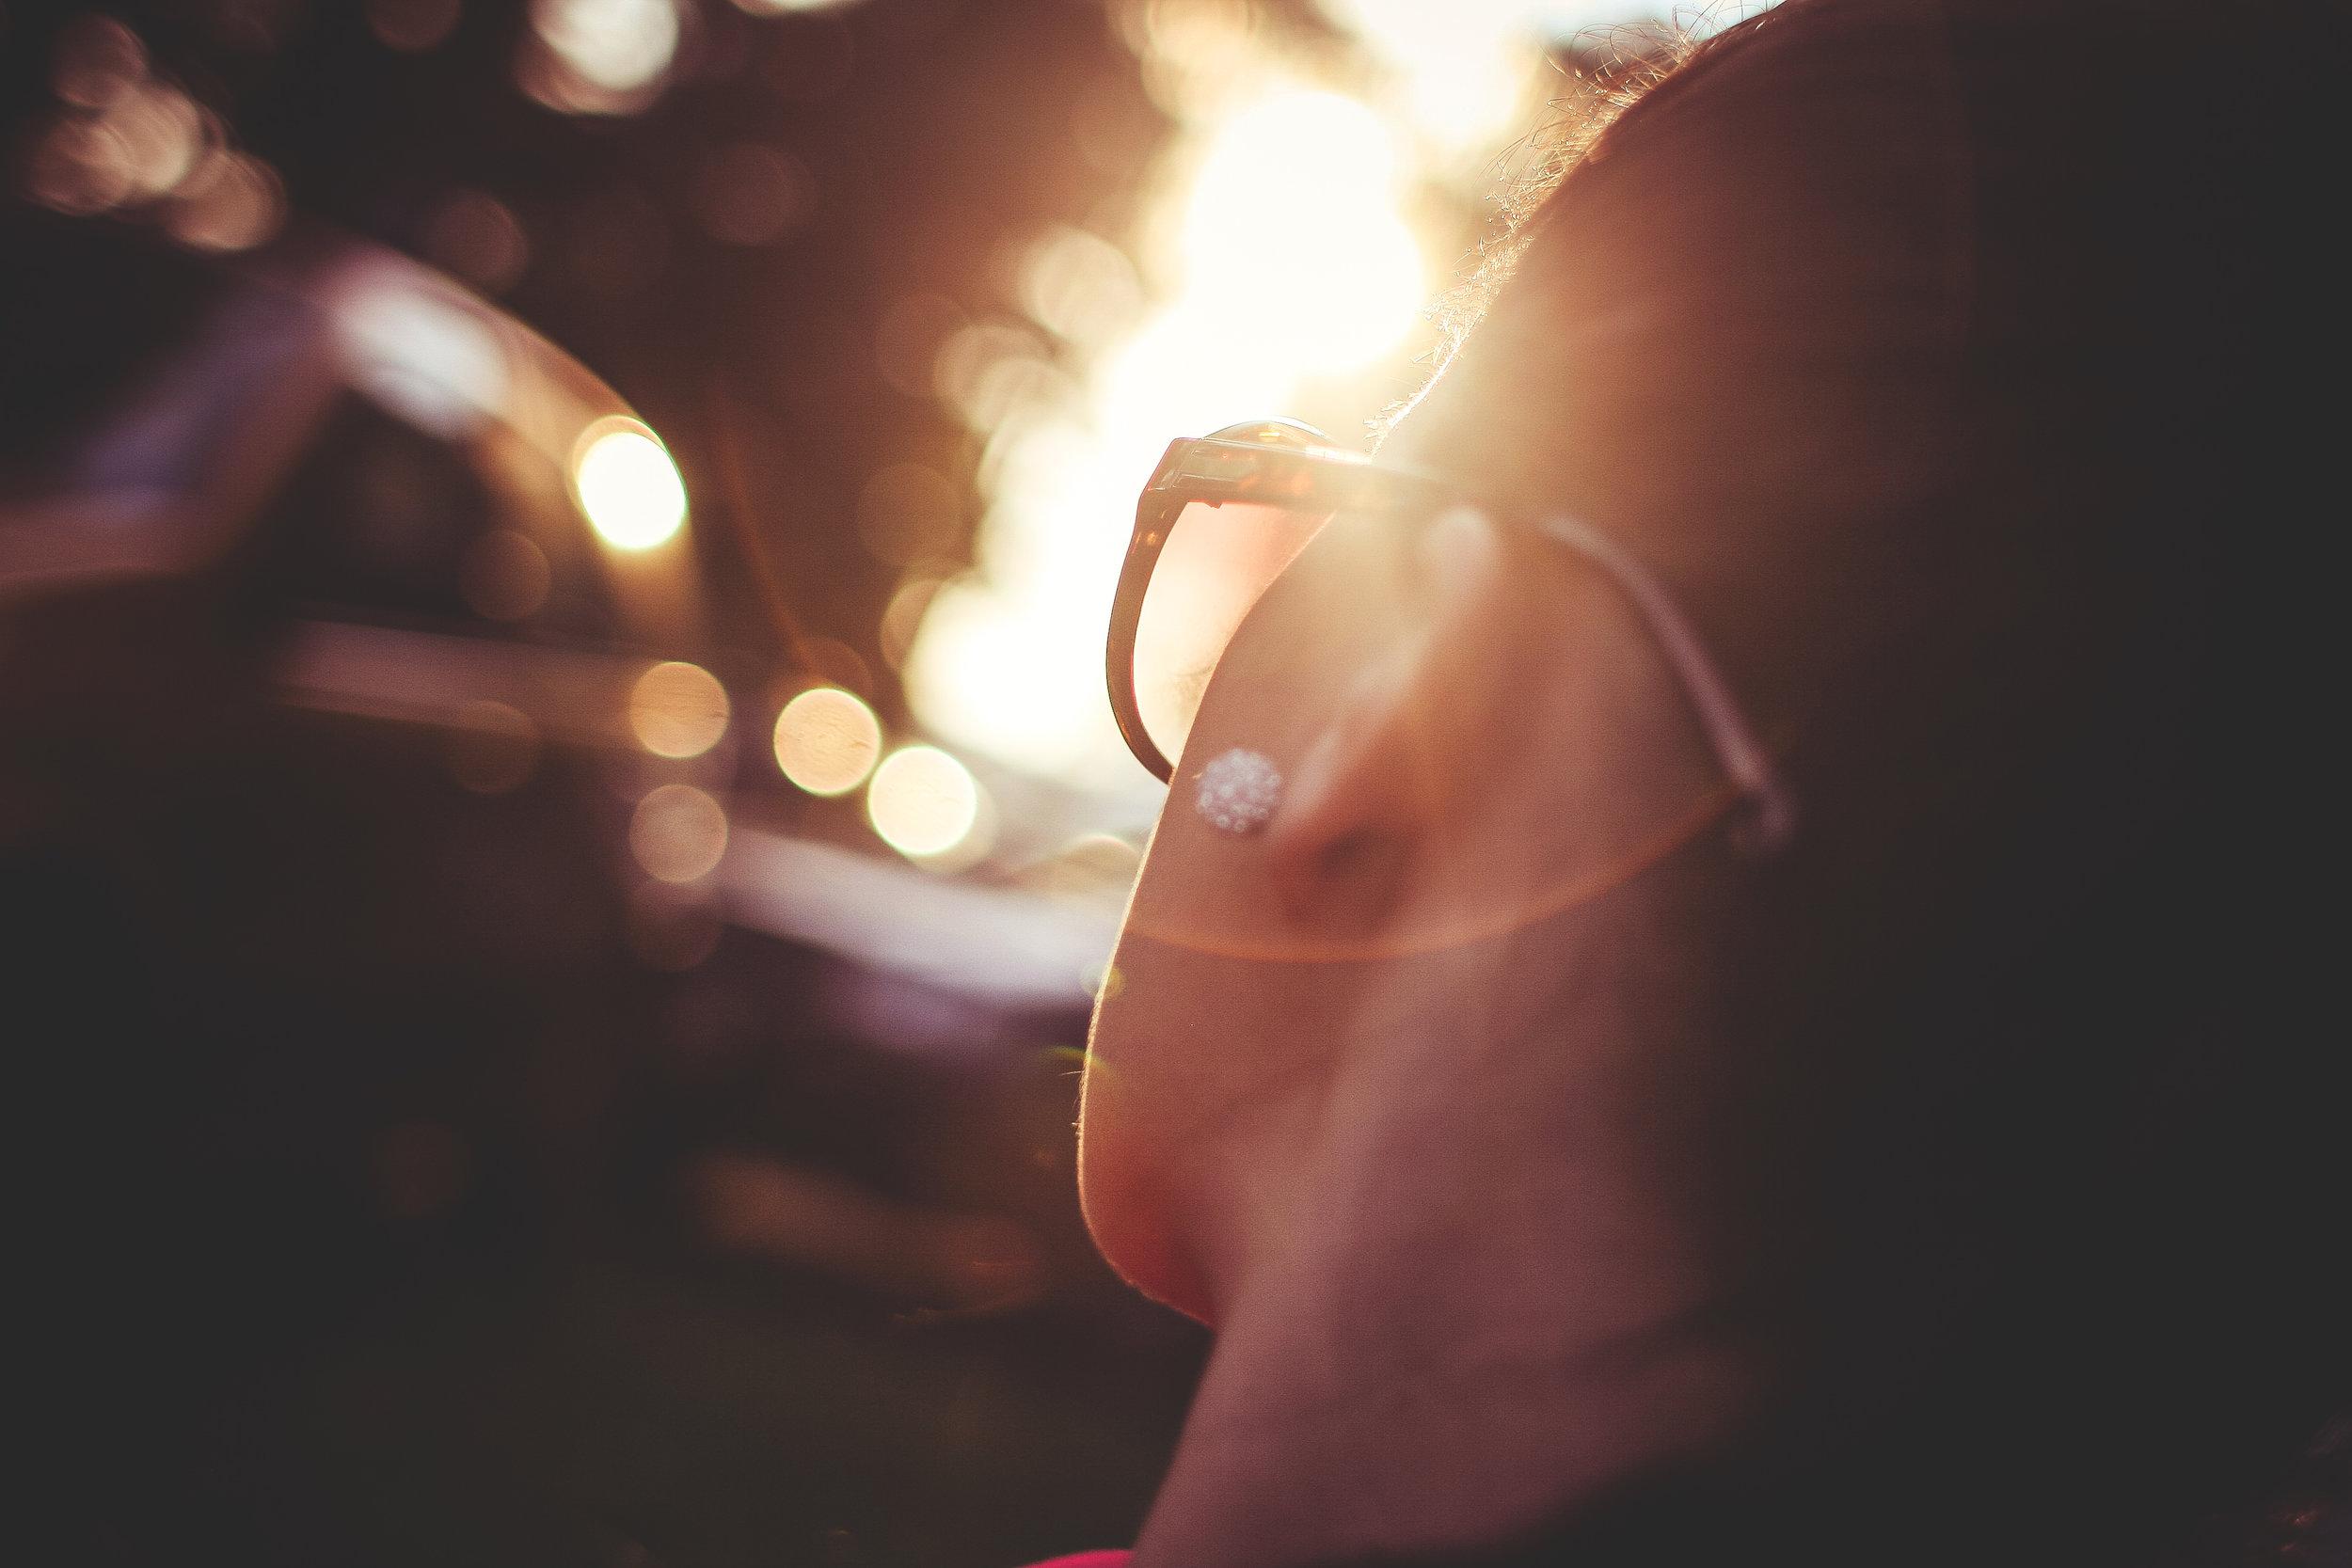 abstract-sunset-girl-picjumbo-com.jpg